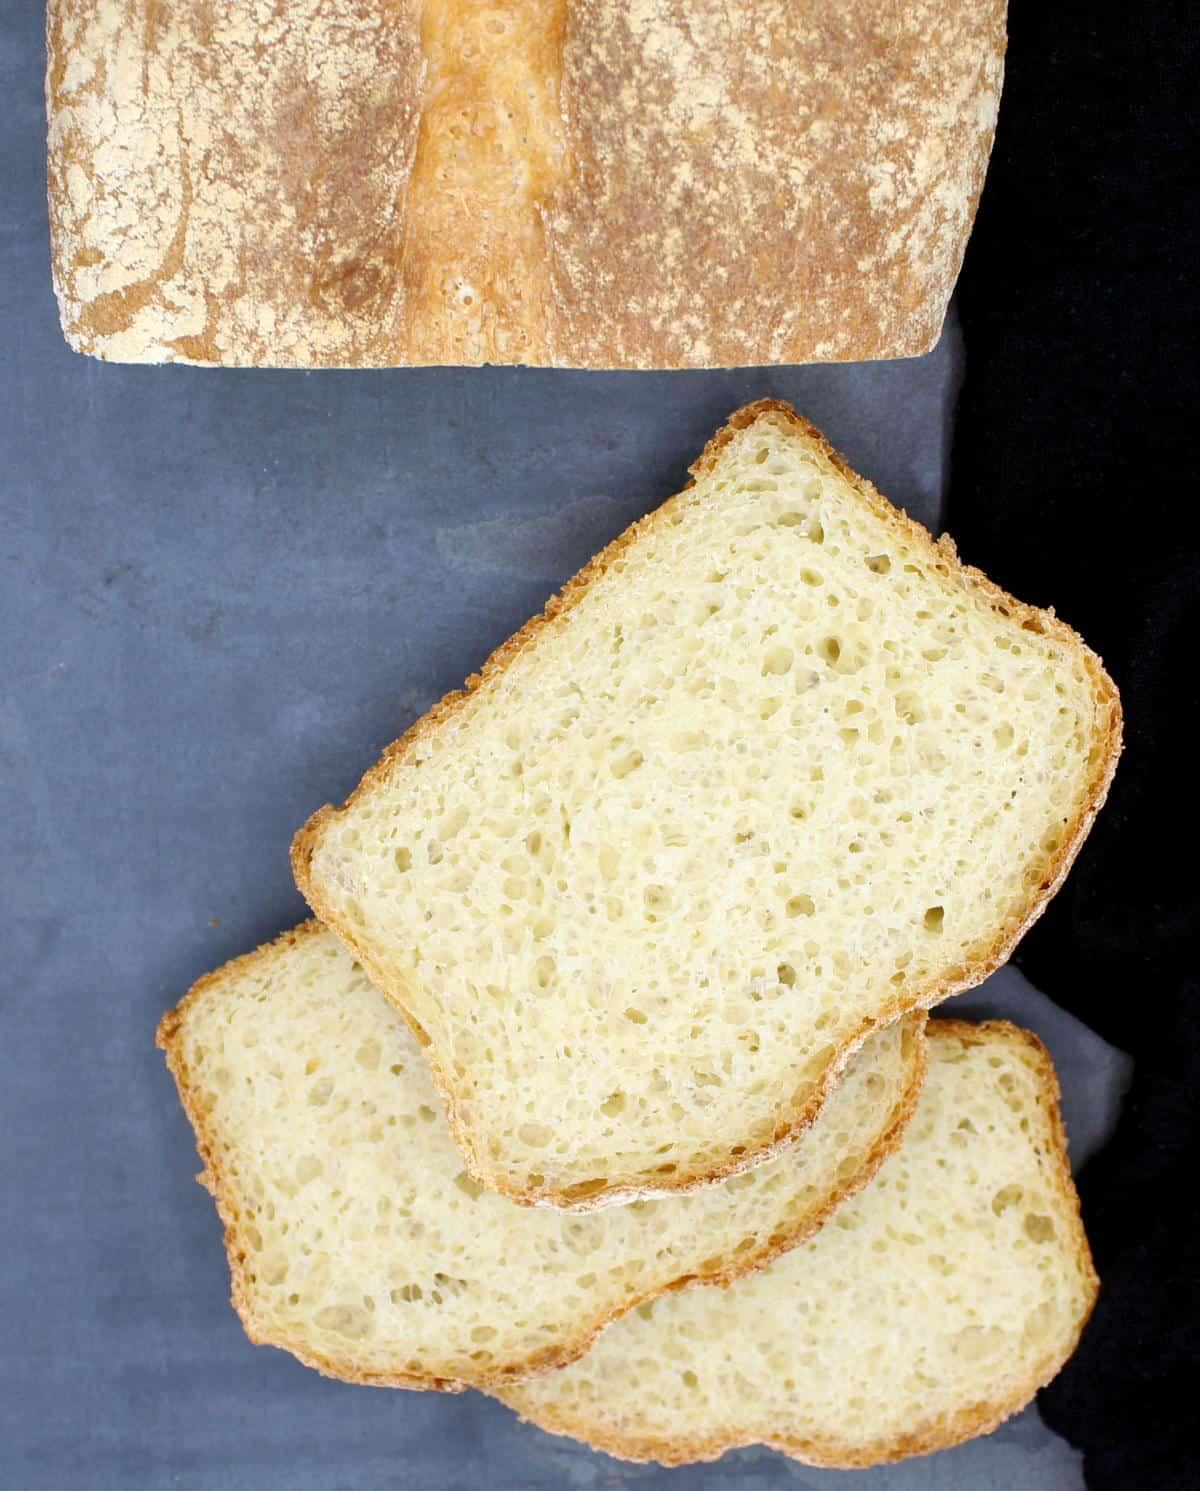 Overhead photo of sliced homemade bread.